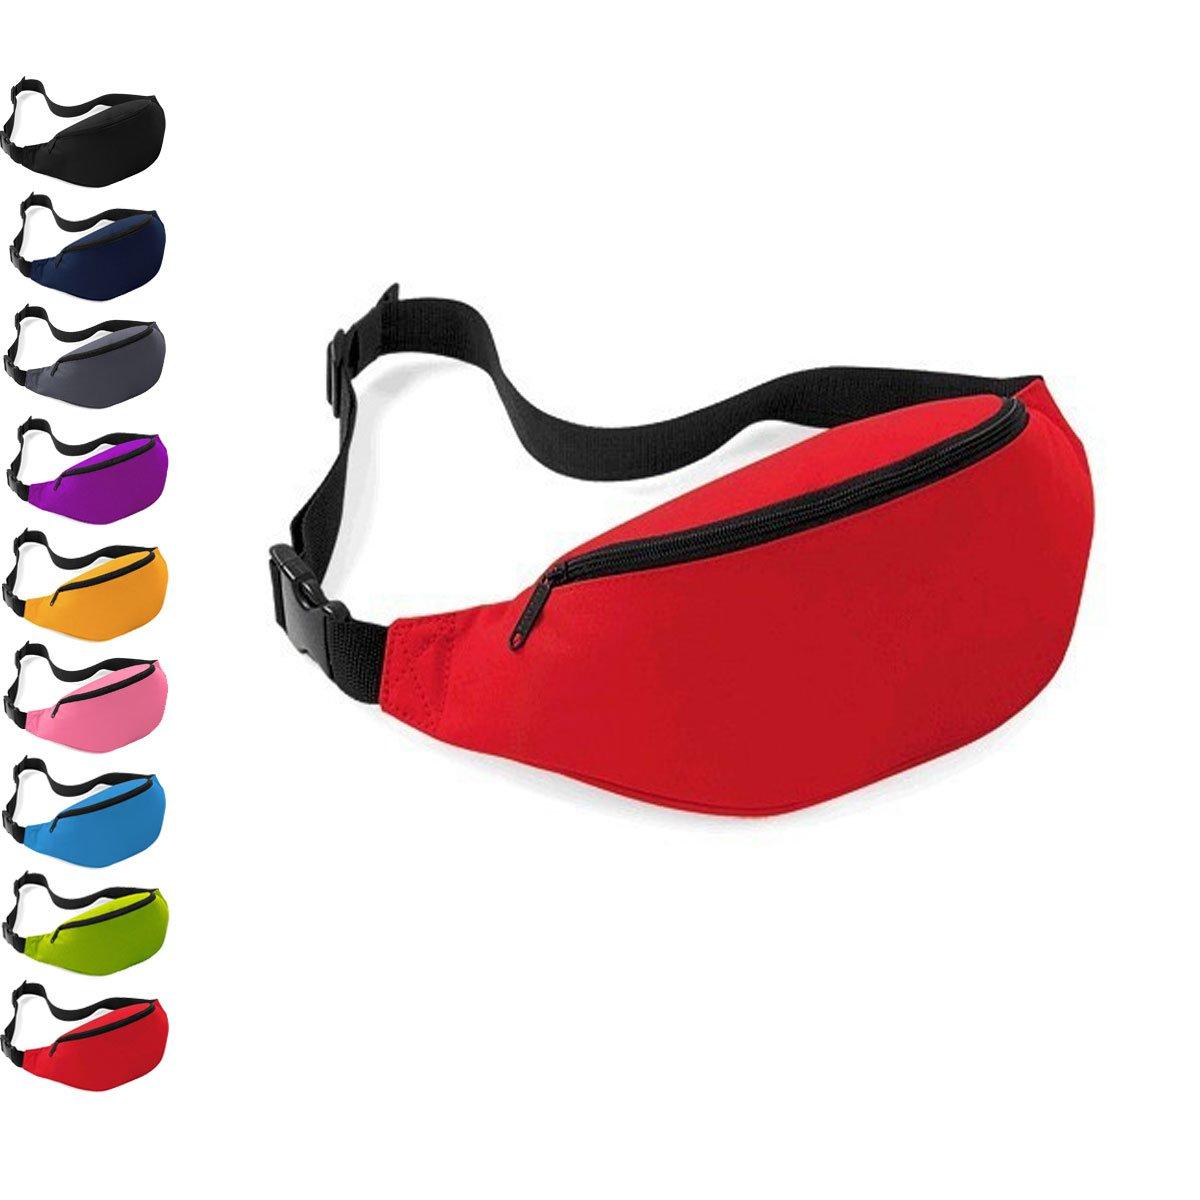 Multifunction Outdoor Travel Sports Waist Fanny Pack Water Bottle Pockets Bag Shoulder Bag Thaoya